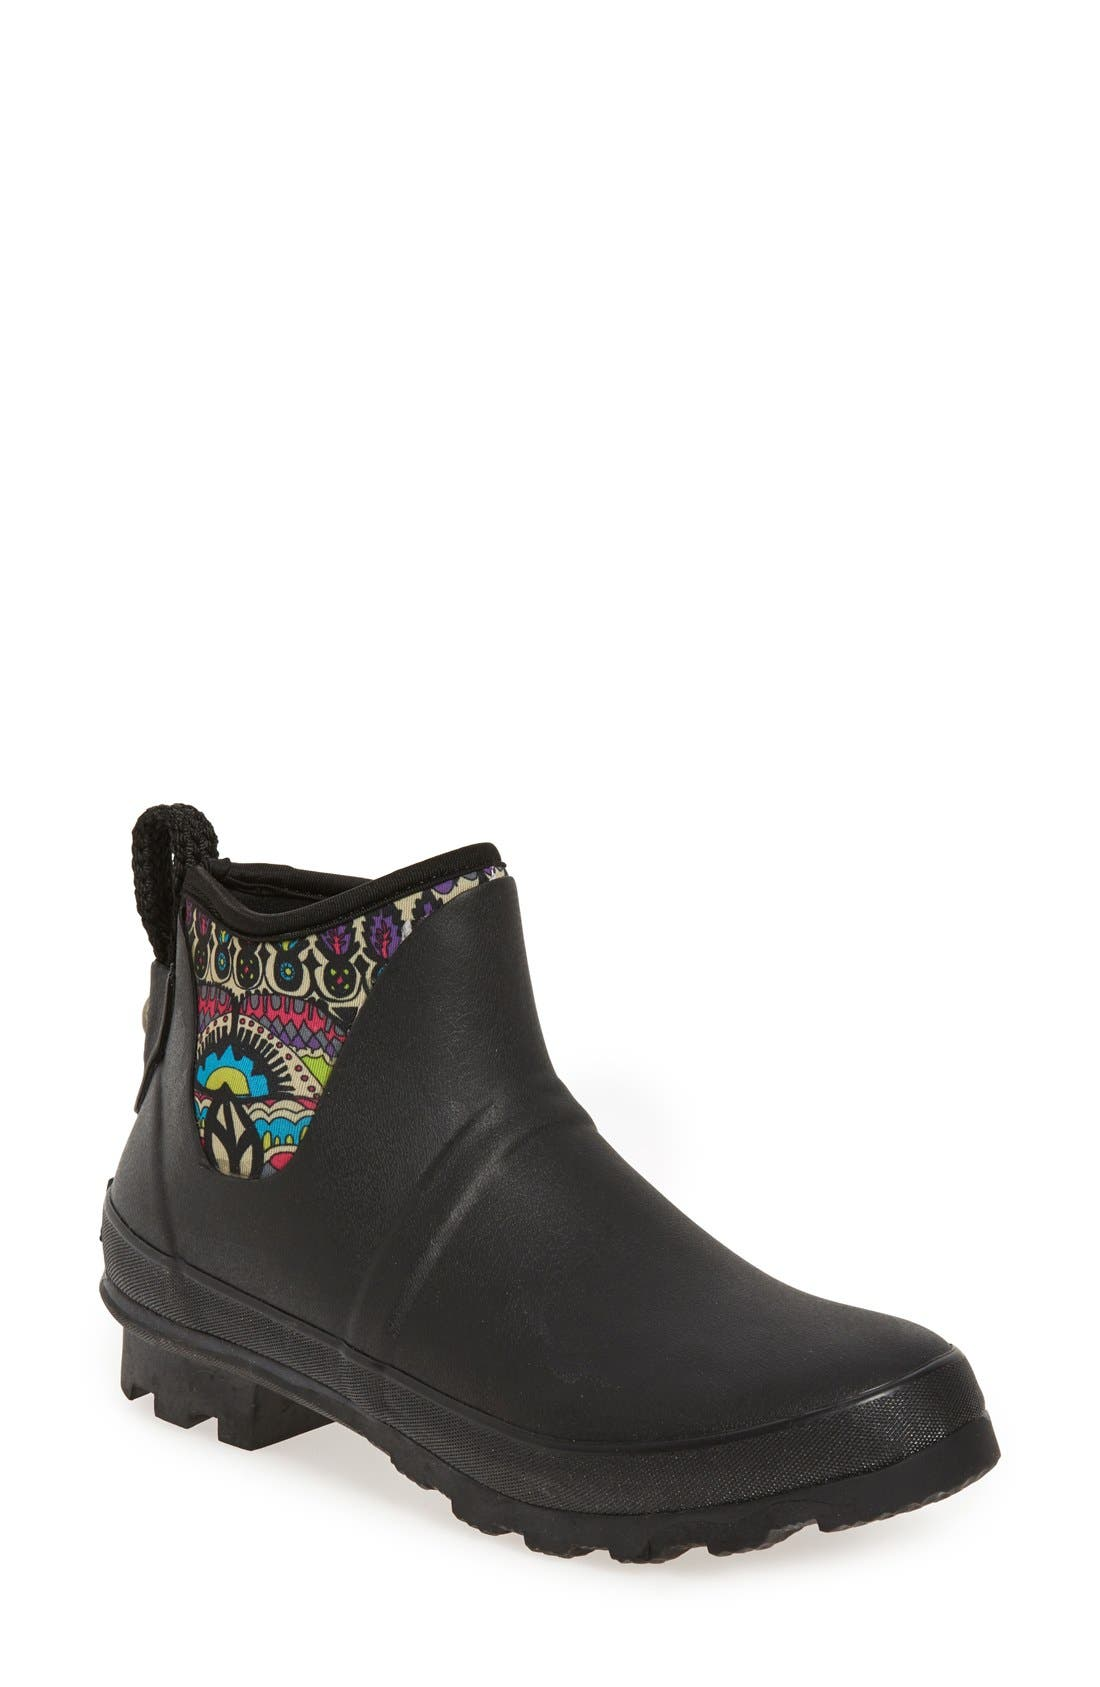 SAKROOTS Mano Waterproof Rain Boot